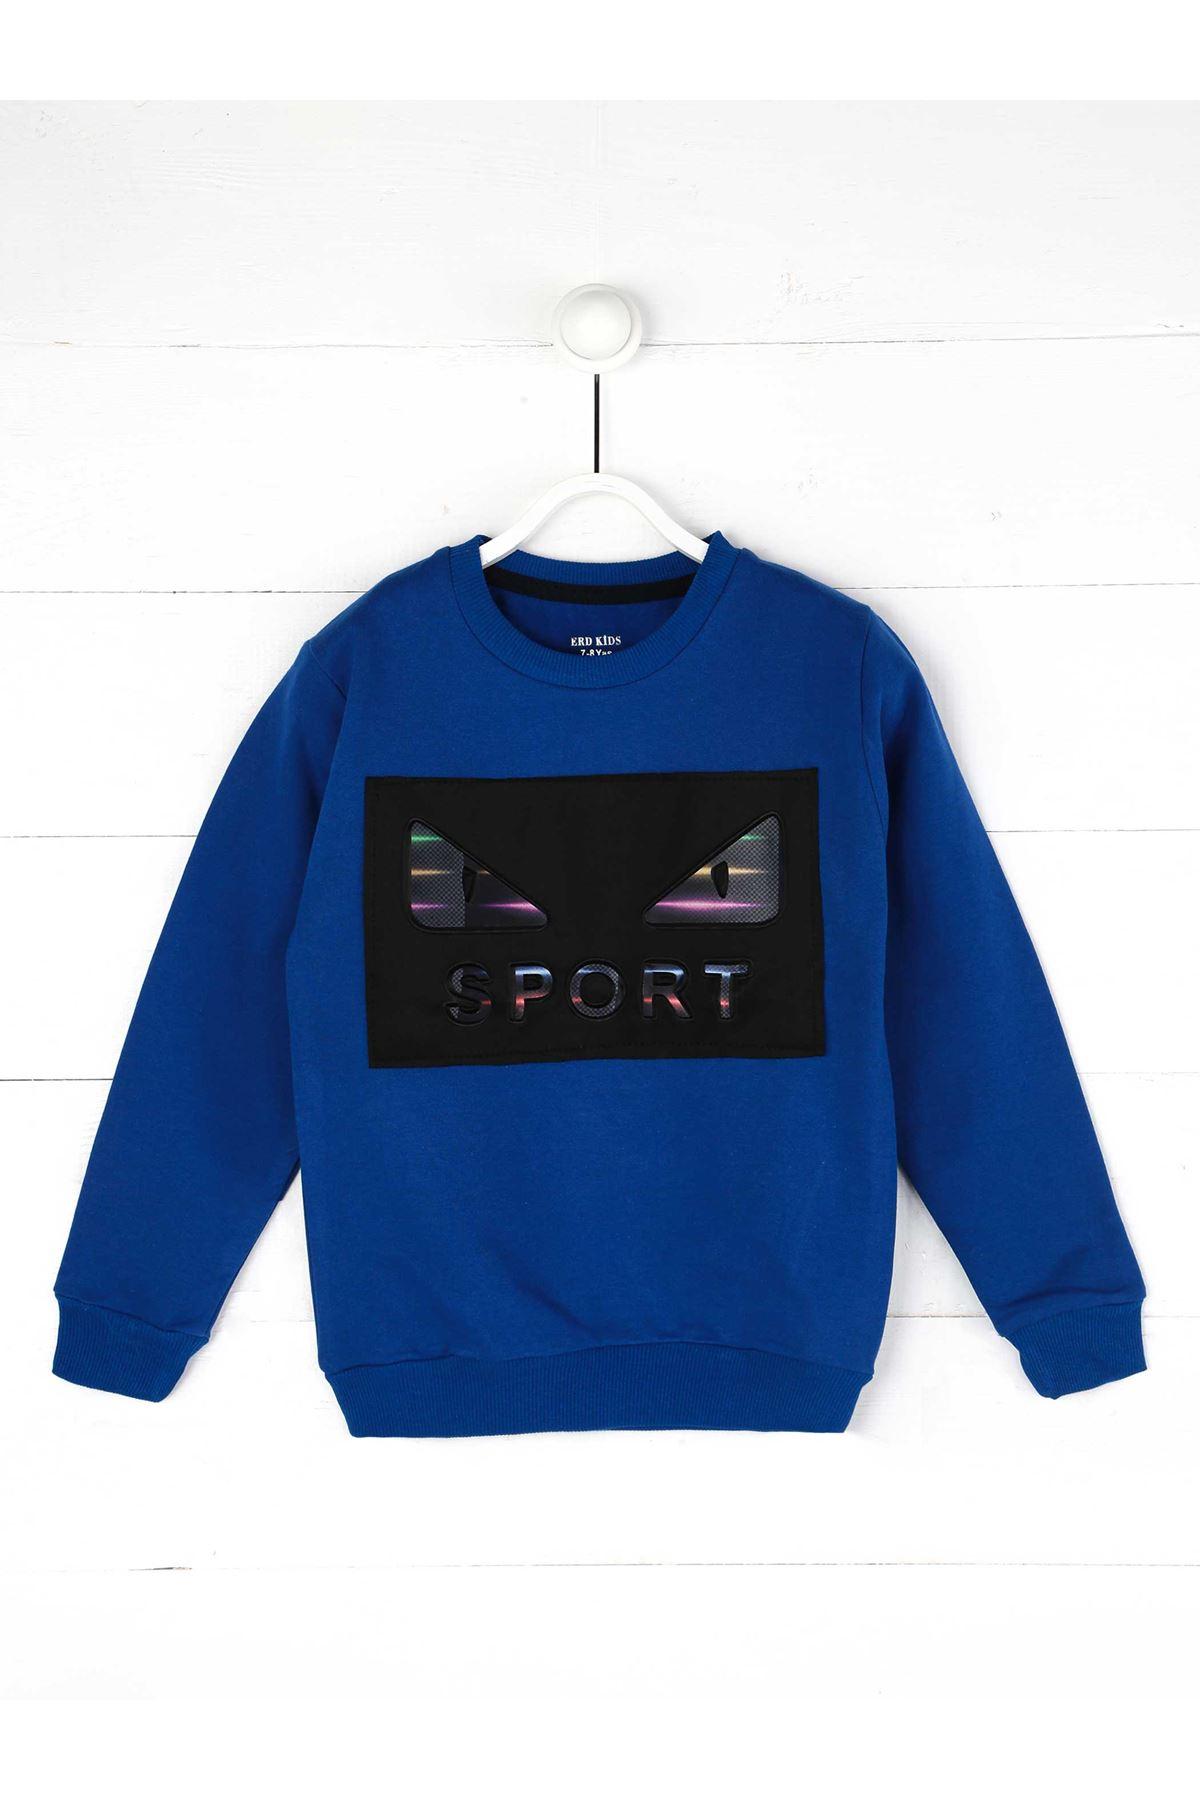 Sax Seasonal Male Child Sweatshirt